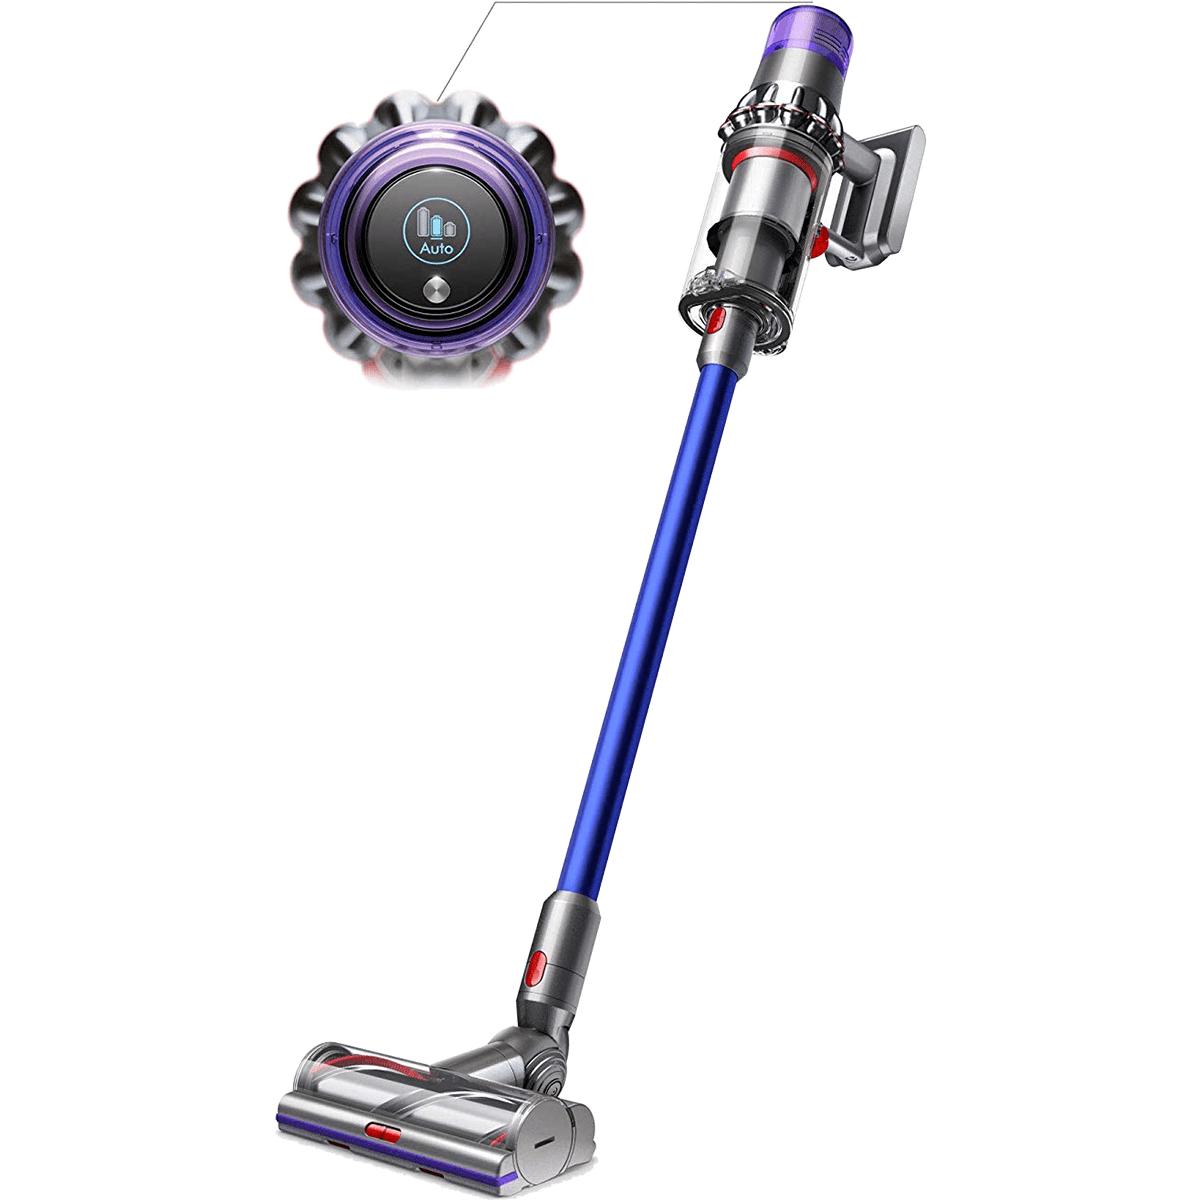 Dyson V11 Torque Drive Cordless Stick Vacuum